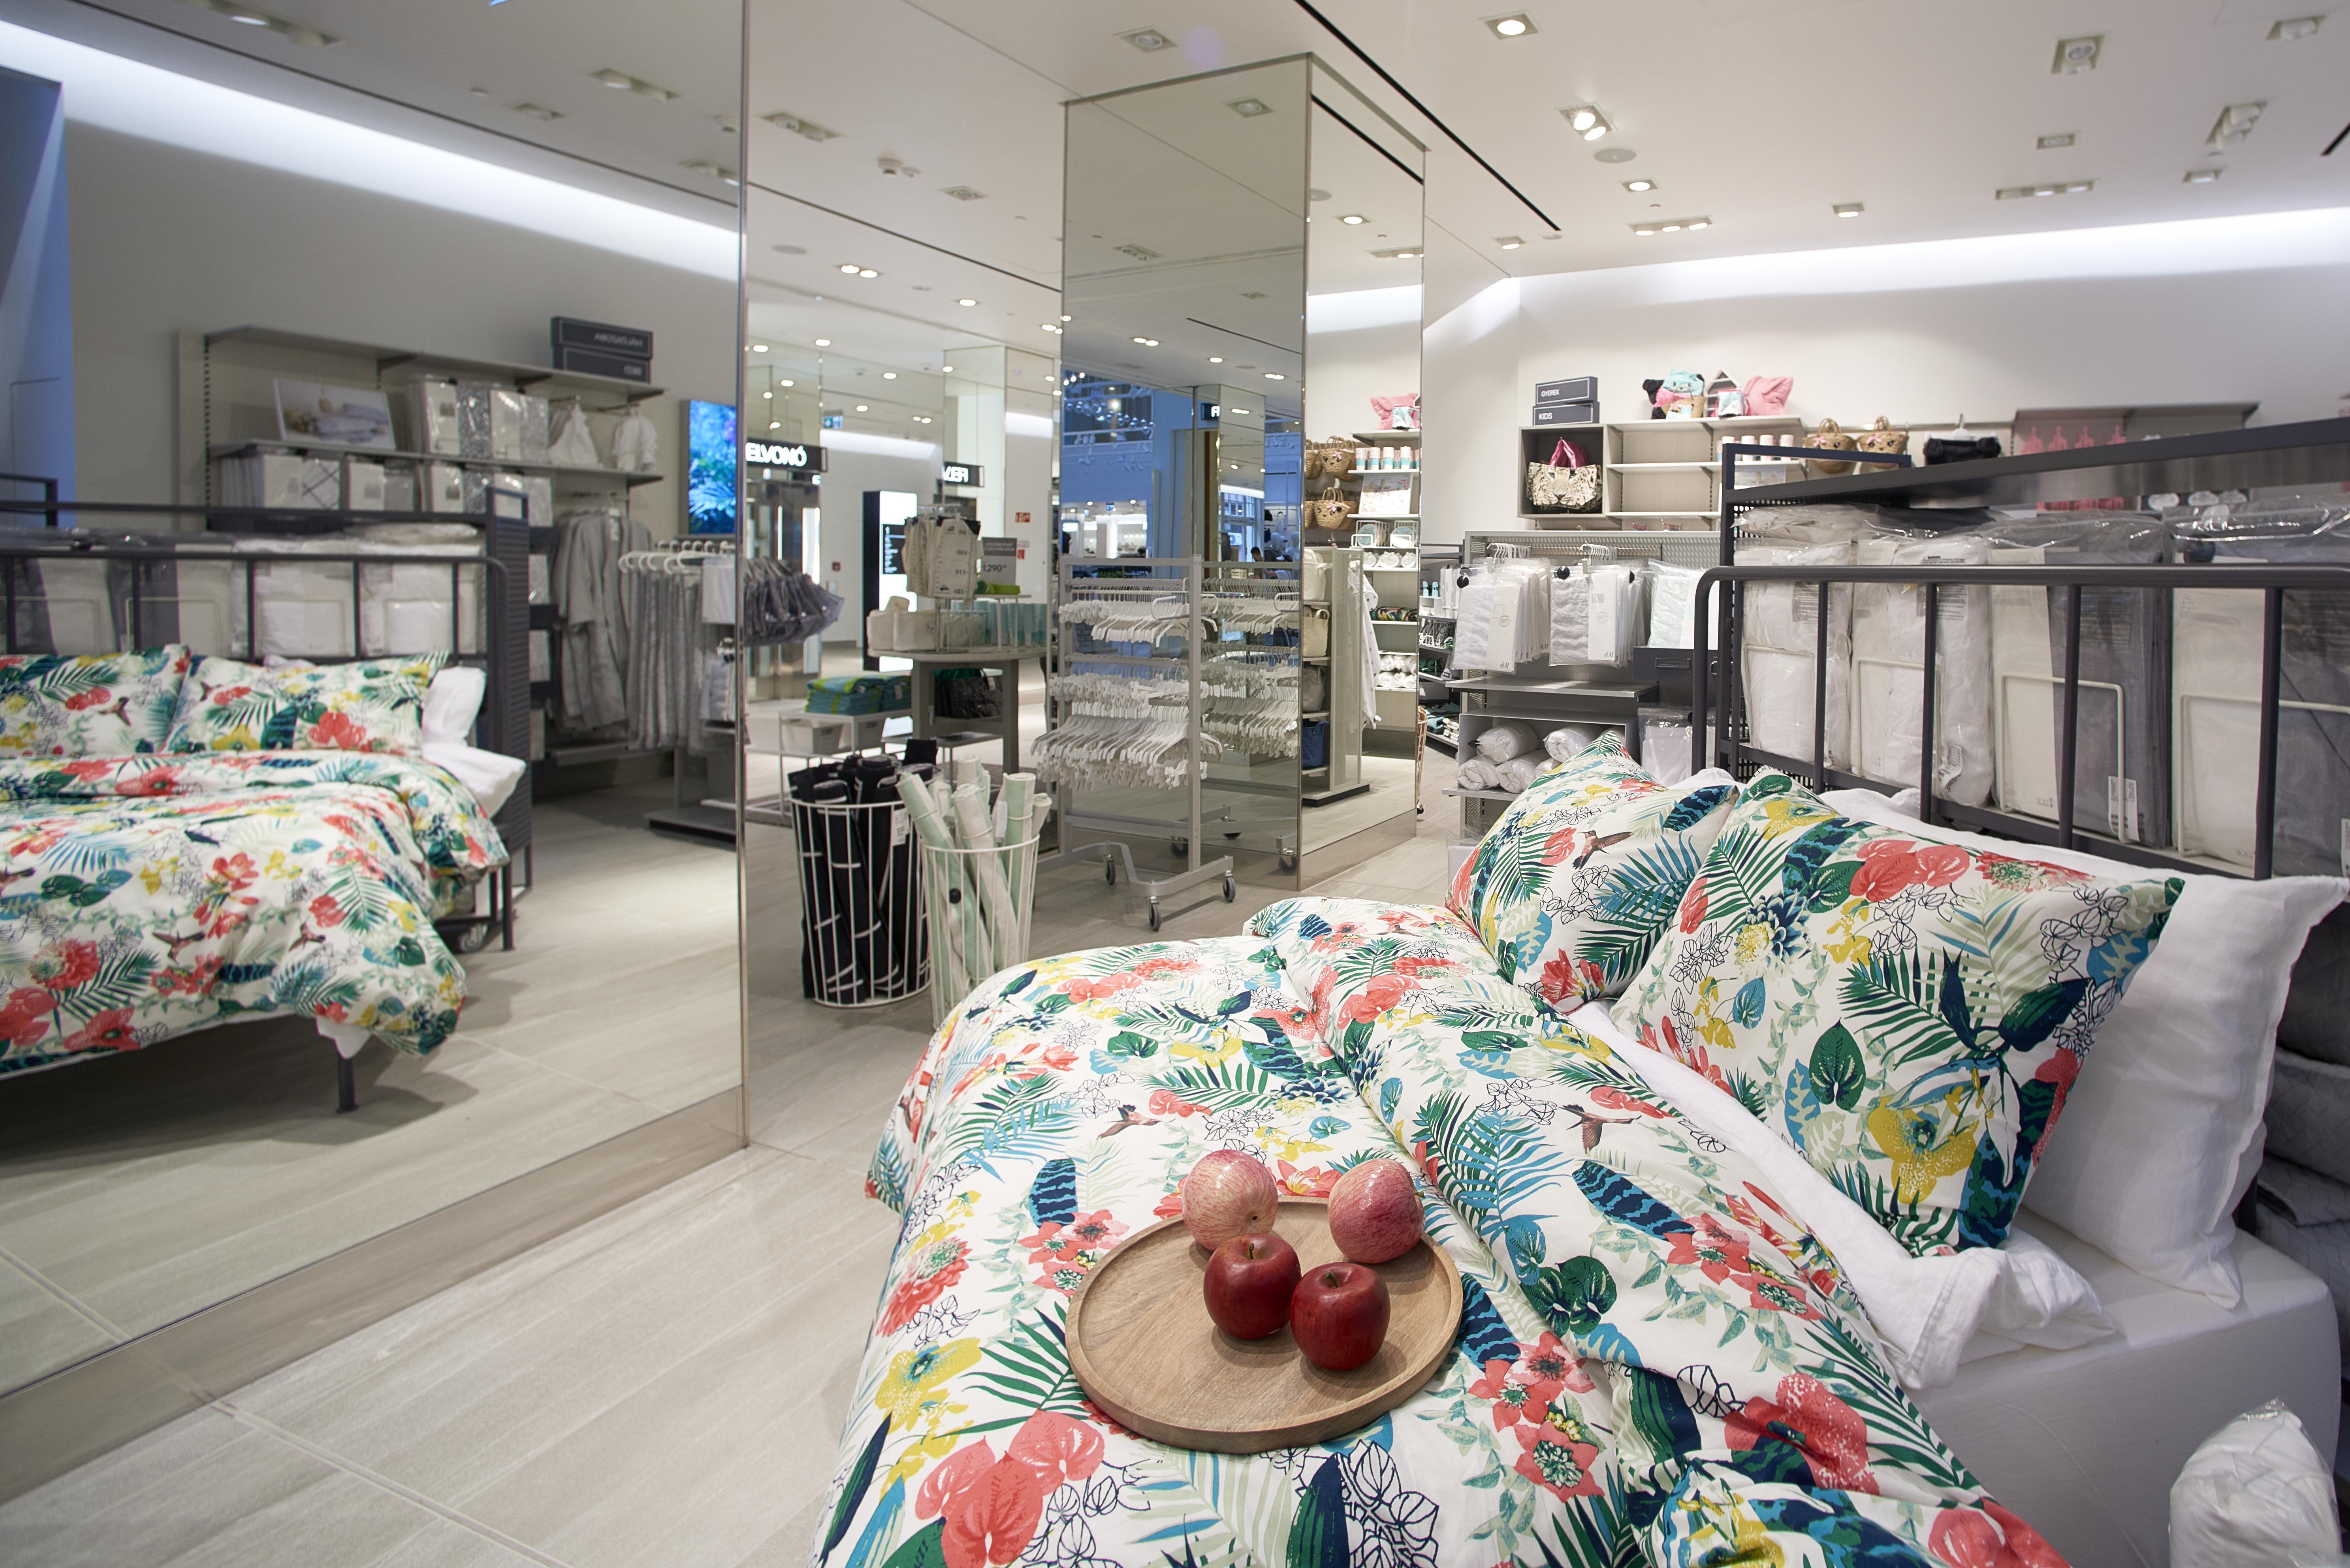 26._hm_flagship_store_home_interior_vaci1_budapest_hungary